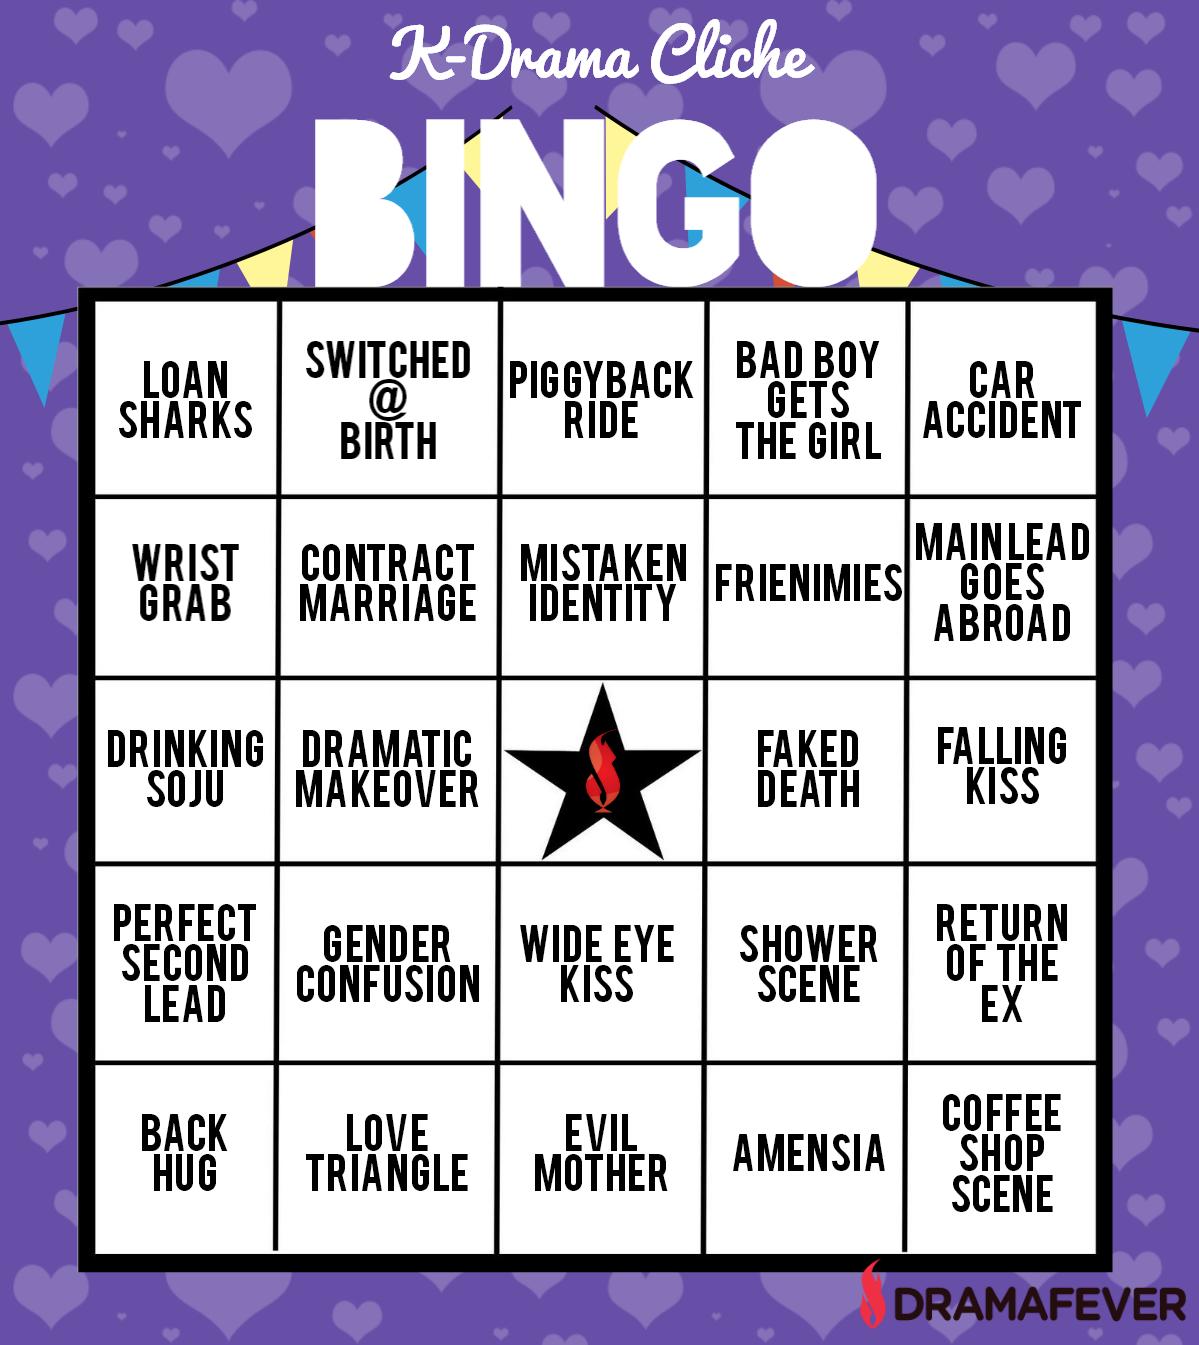 Club Bingo Roblox Bingo Template Kdrama Five Common Misconceptions About Bingo Template Kdrama In 2020 Kdrama Drama Bingo